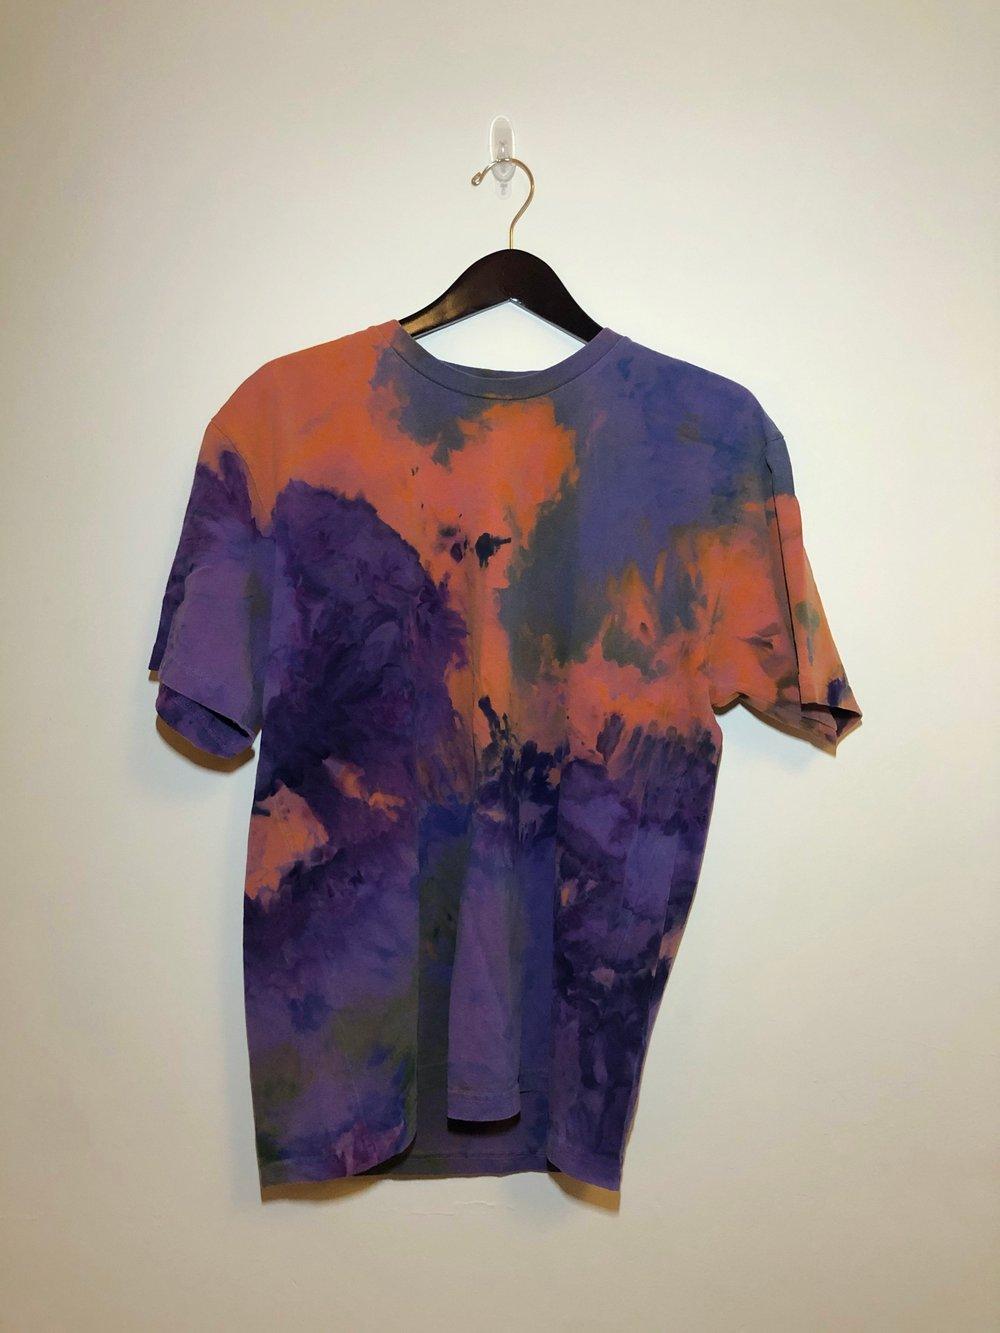 Shirt #3 - Medium